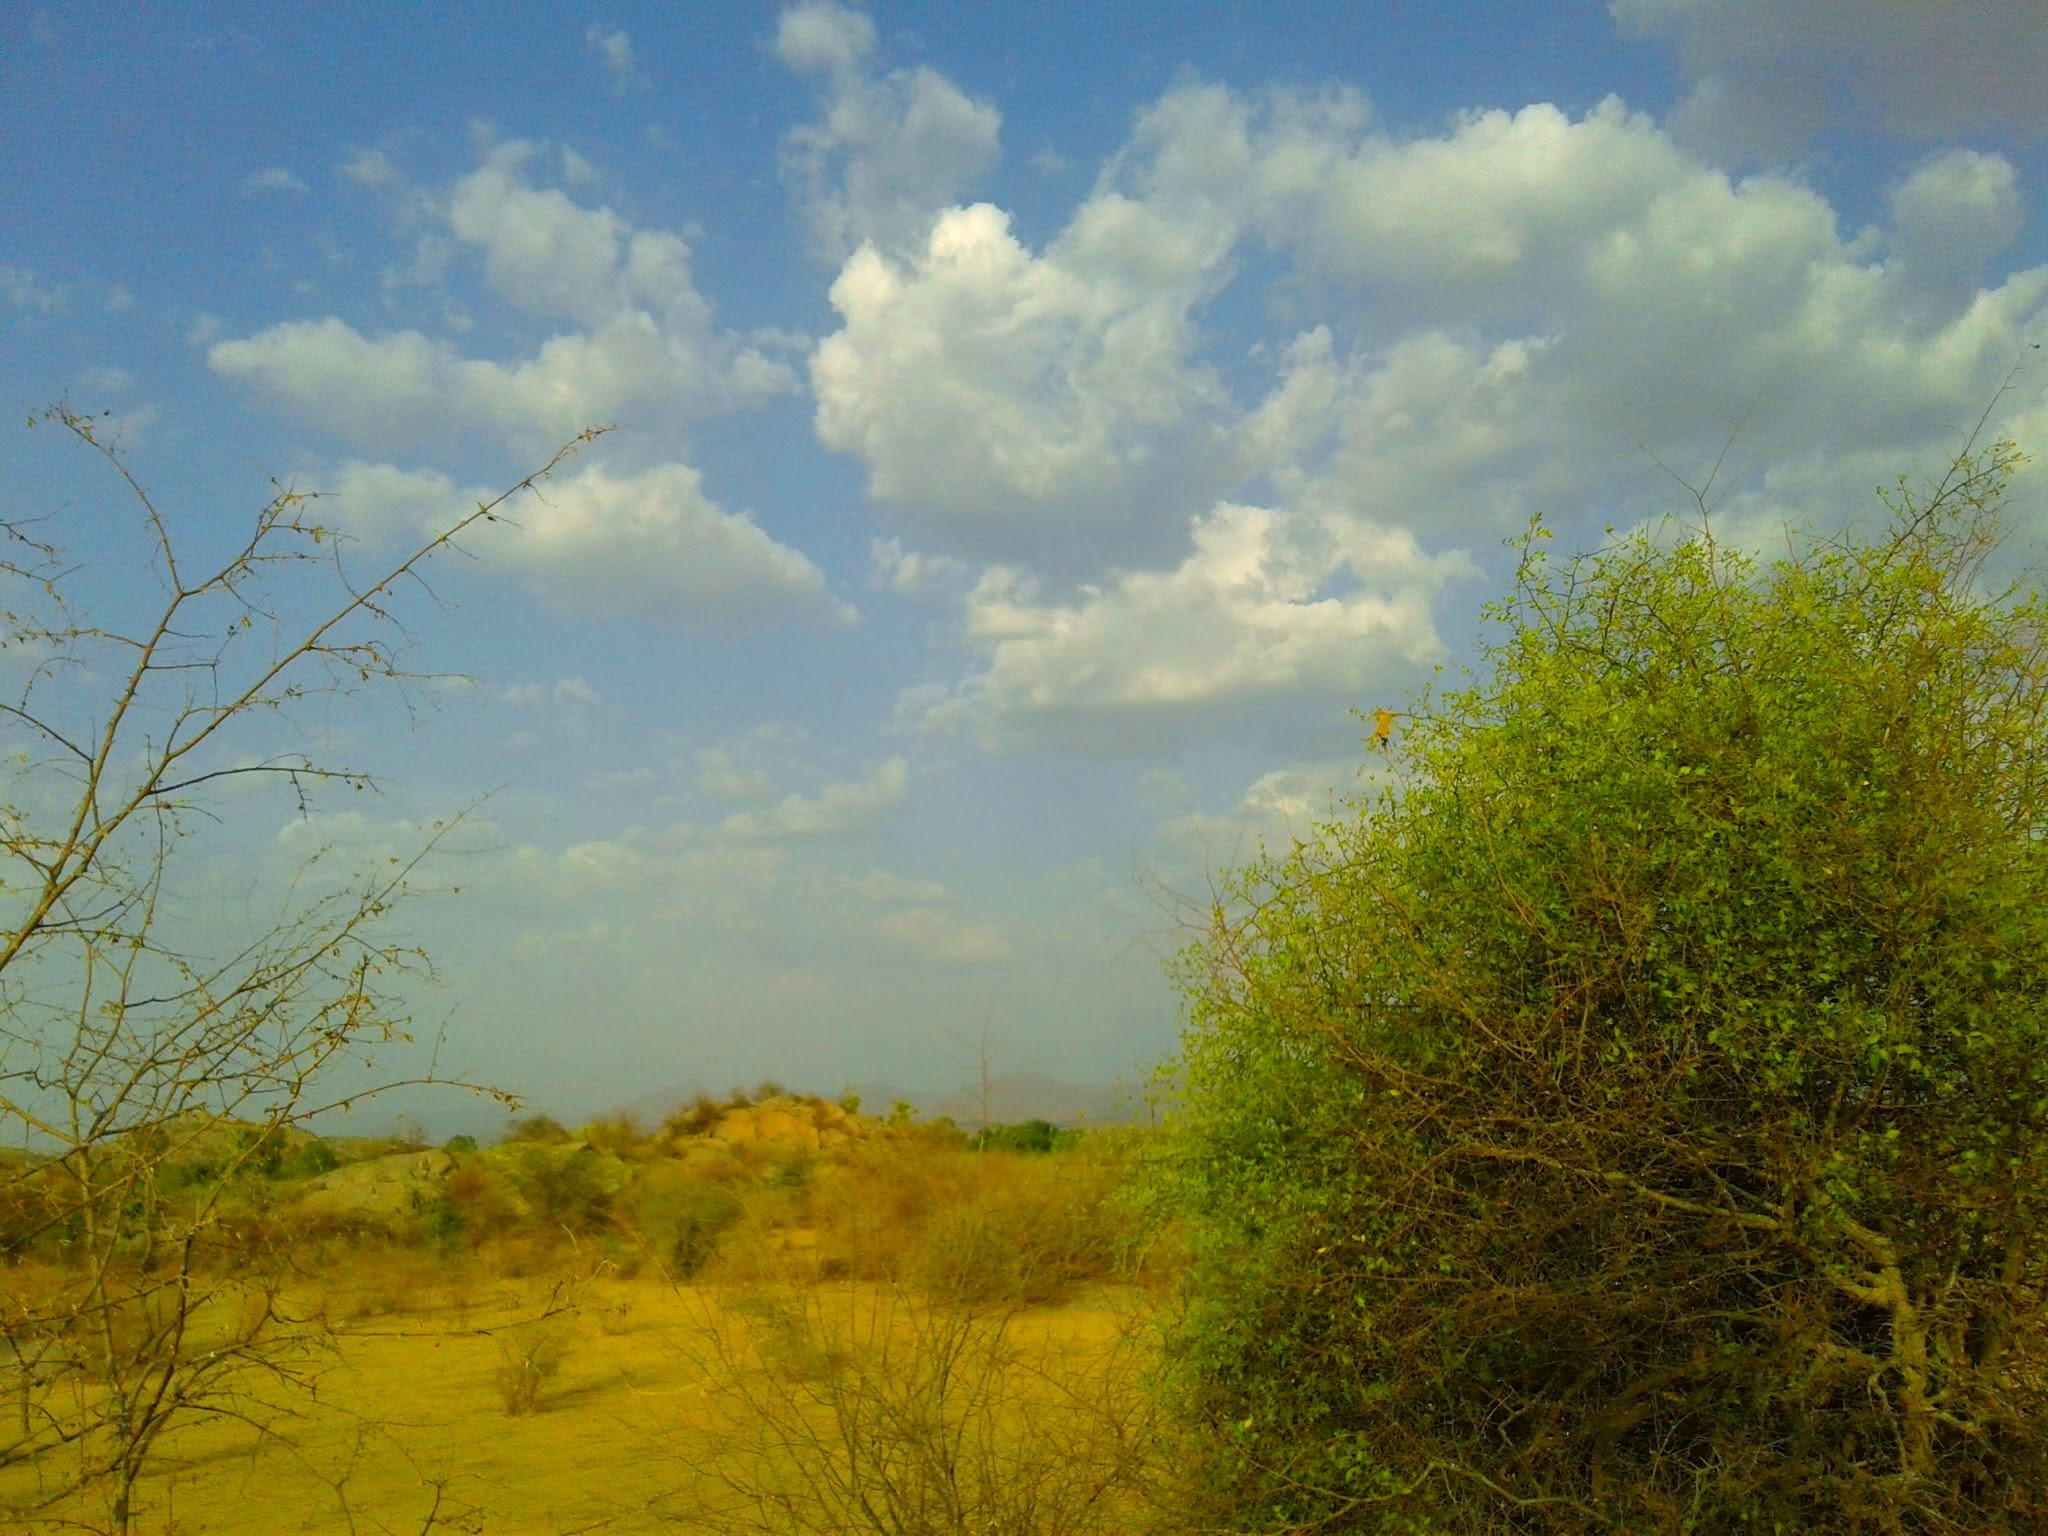 Untitled by Gajendra Singhvi